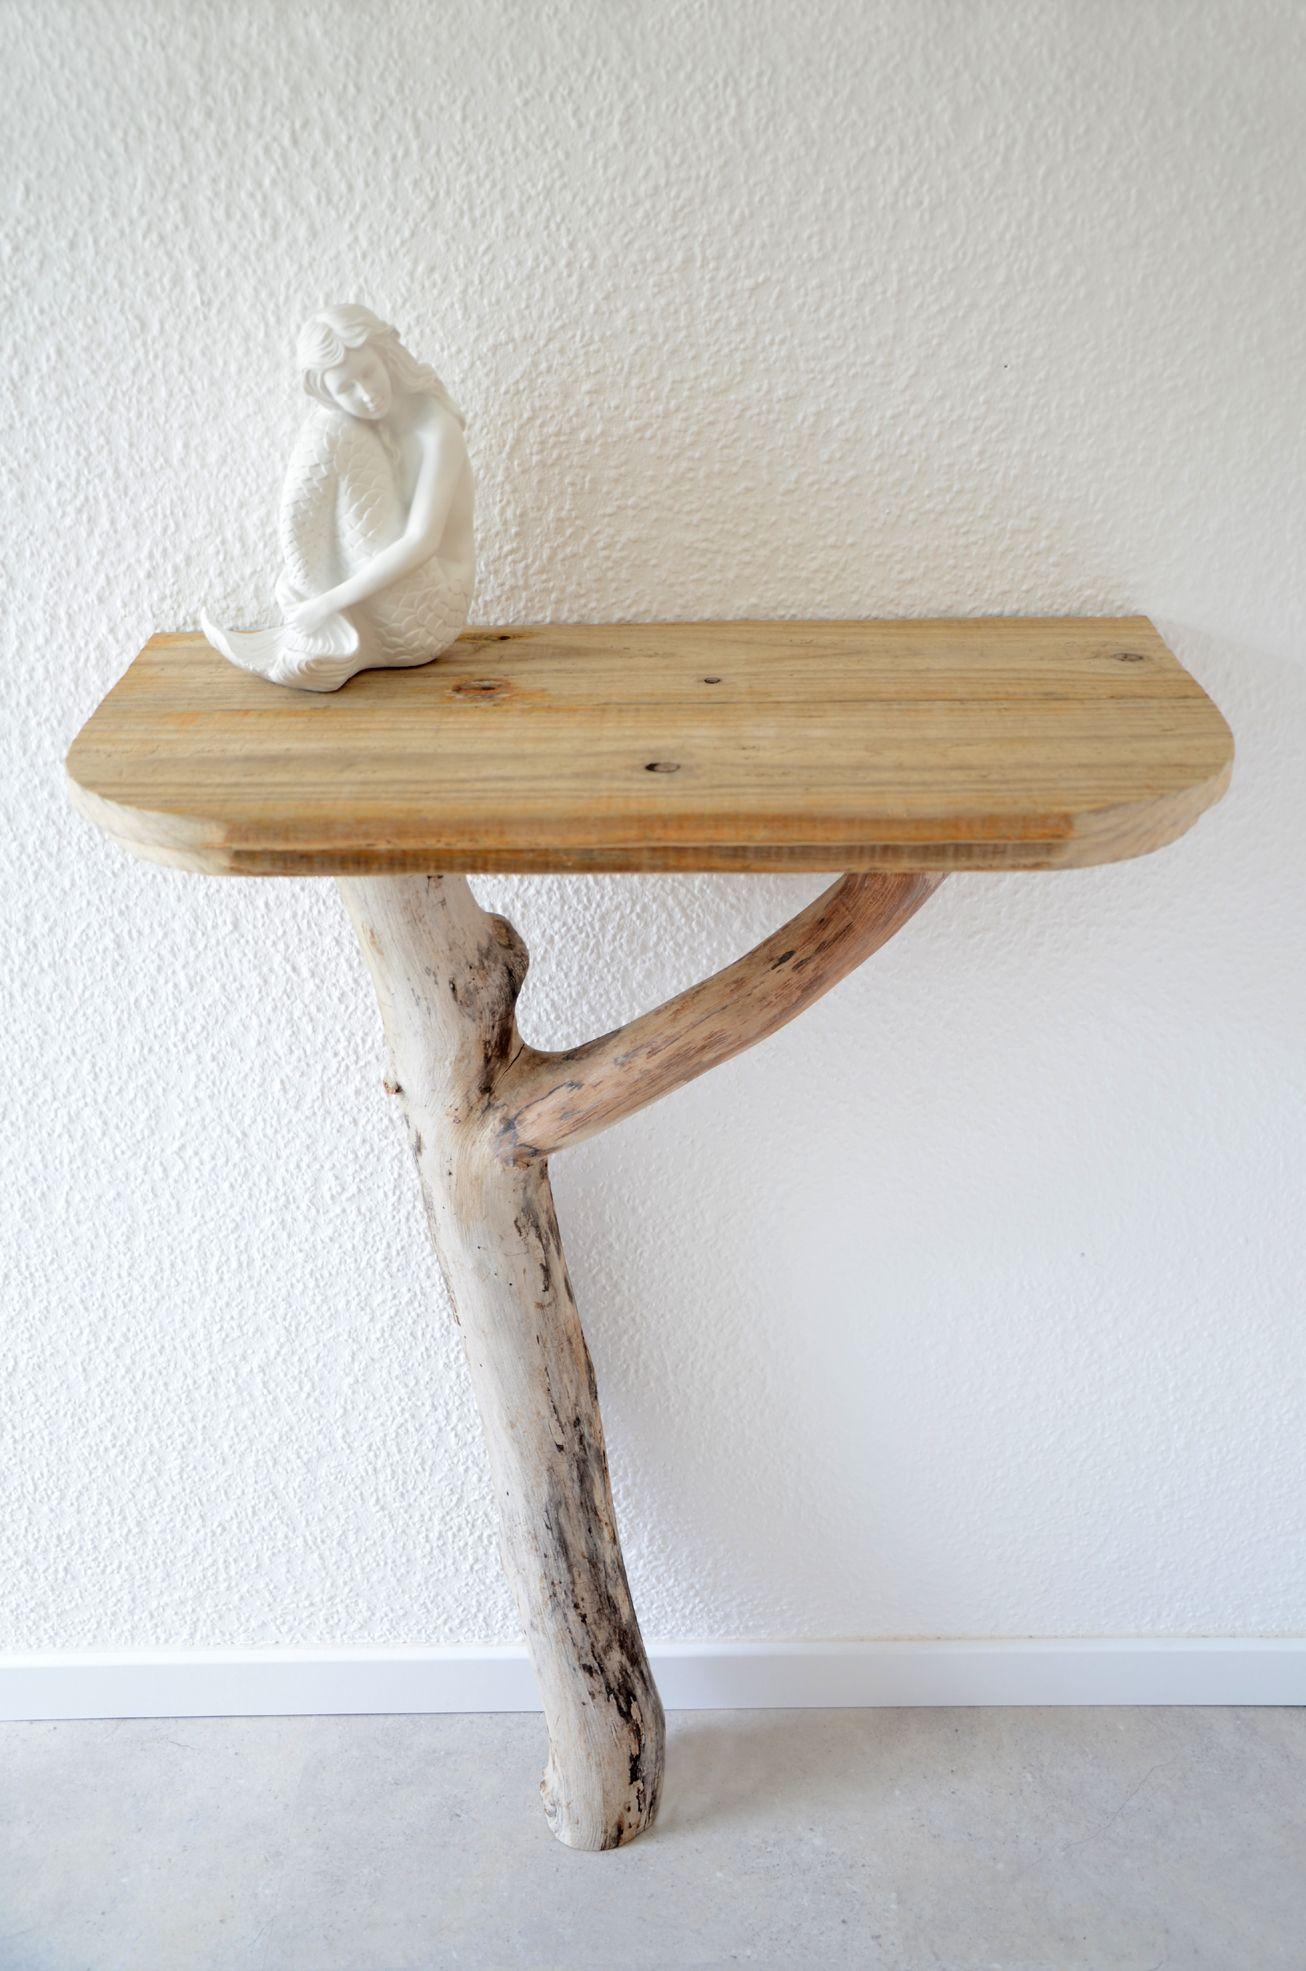 Treibholz-Wandkonsole Friihair ~ Driftwood wall console Made with ...